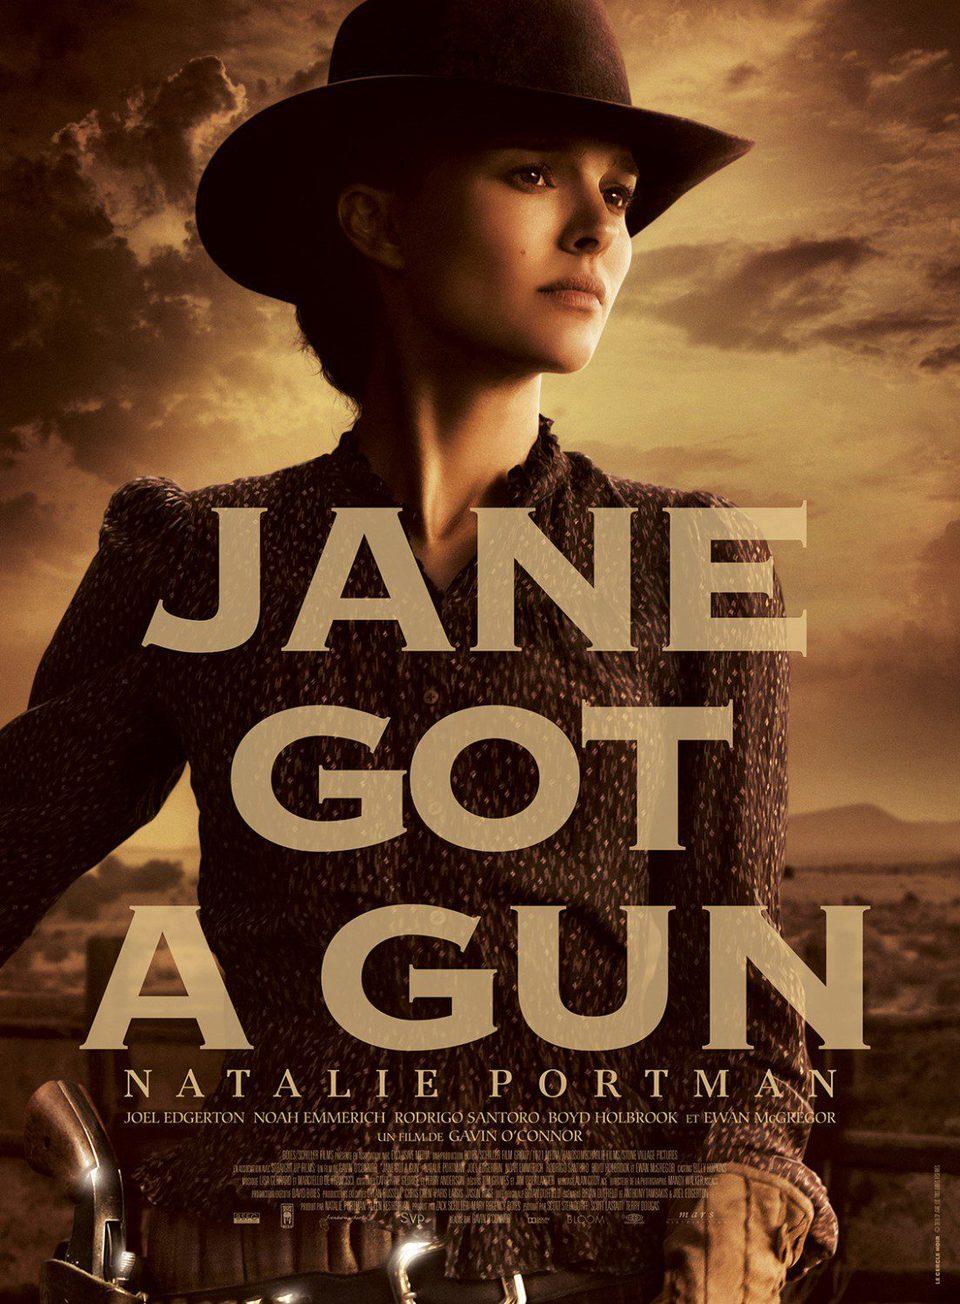 Cartel Natalie Portman de 'La venganza de Jane'